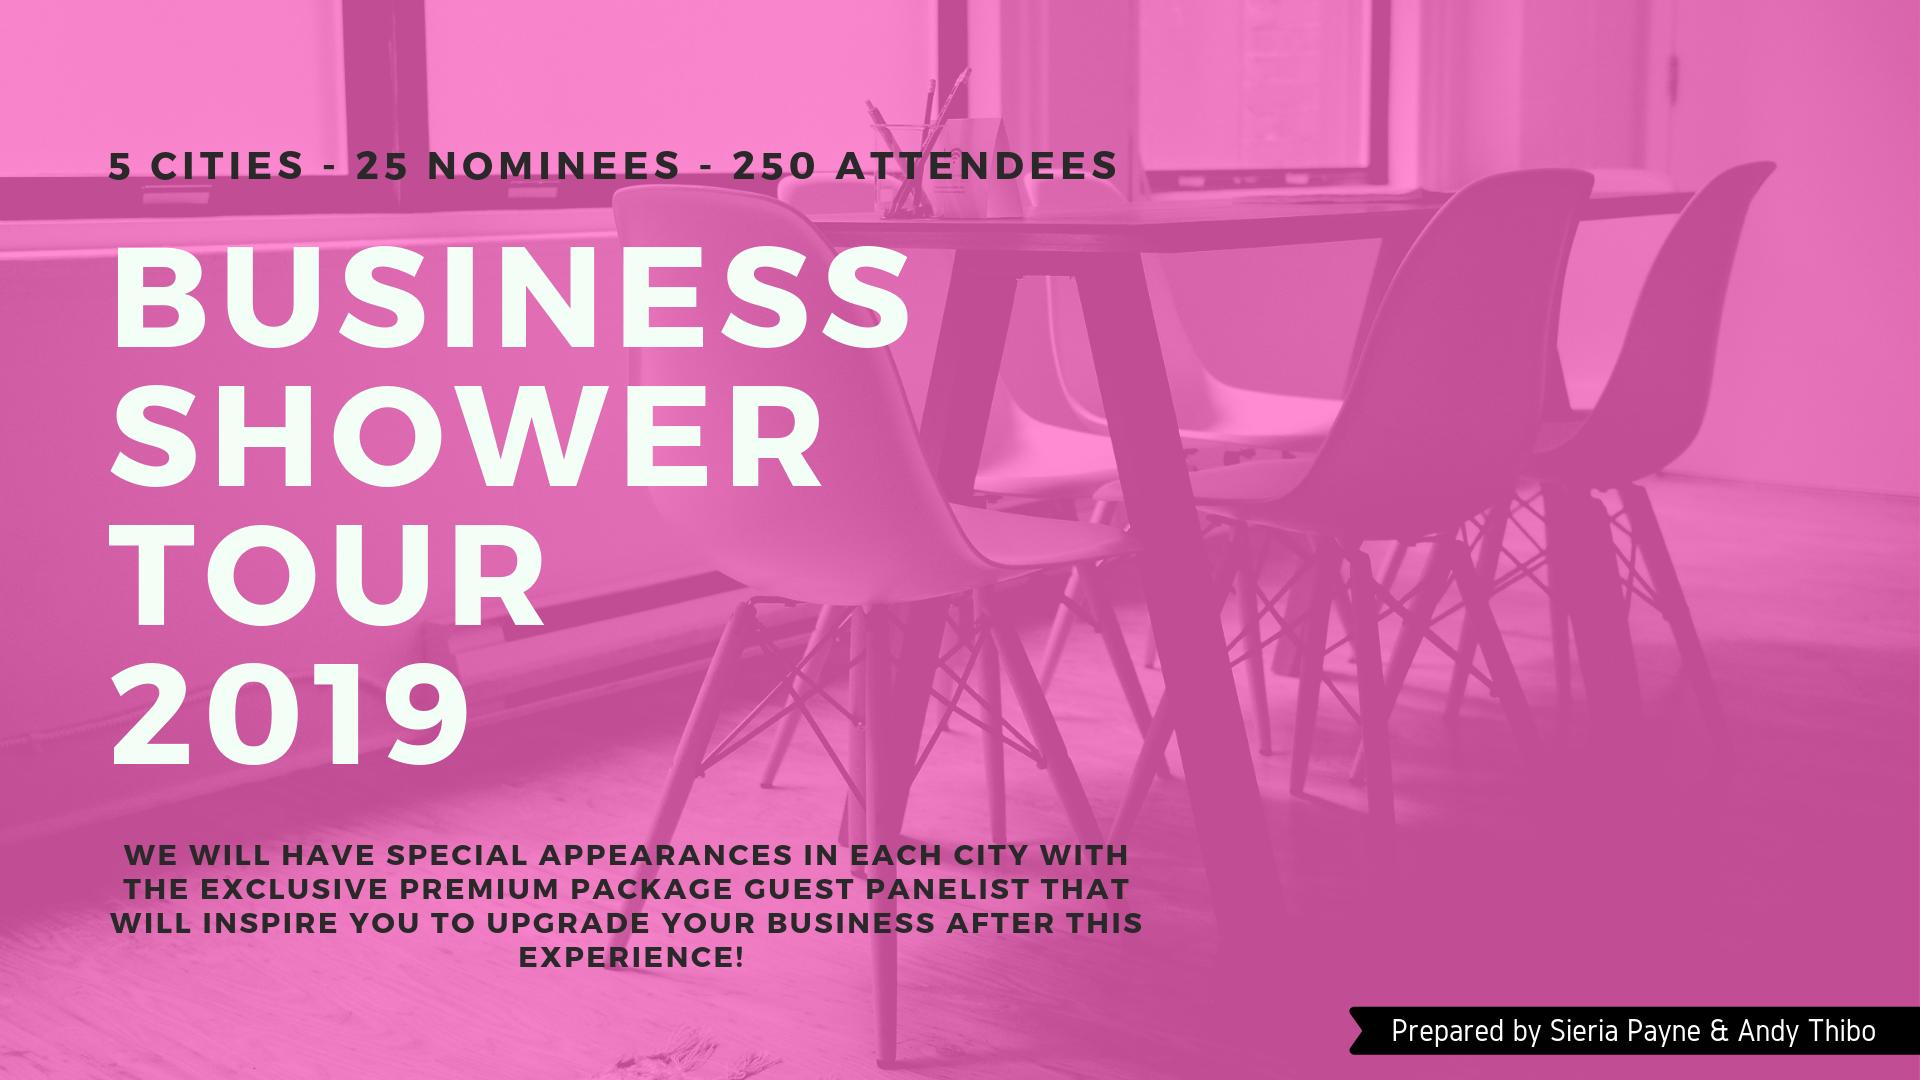 Business Shower Tour 2019 (Panelist).png